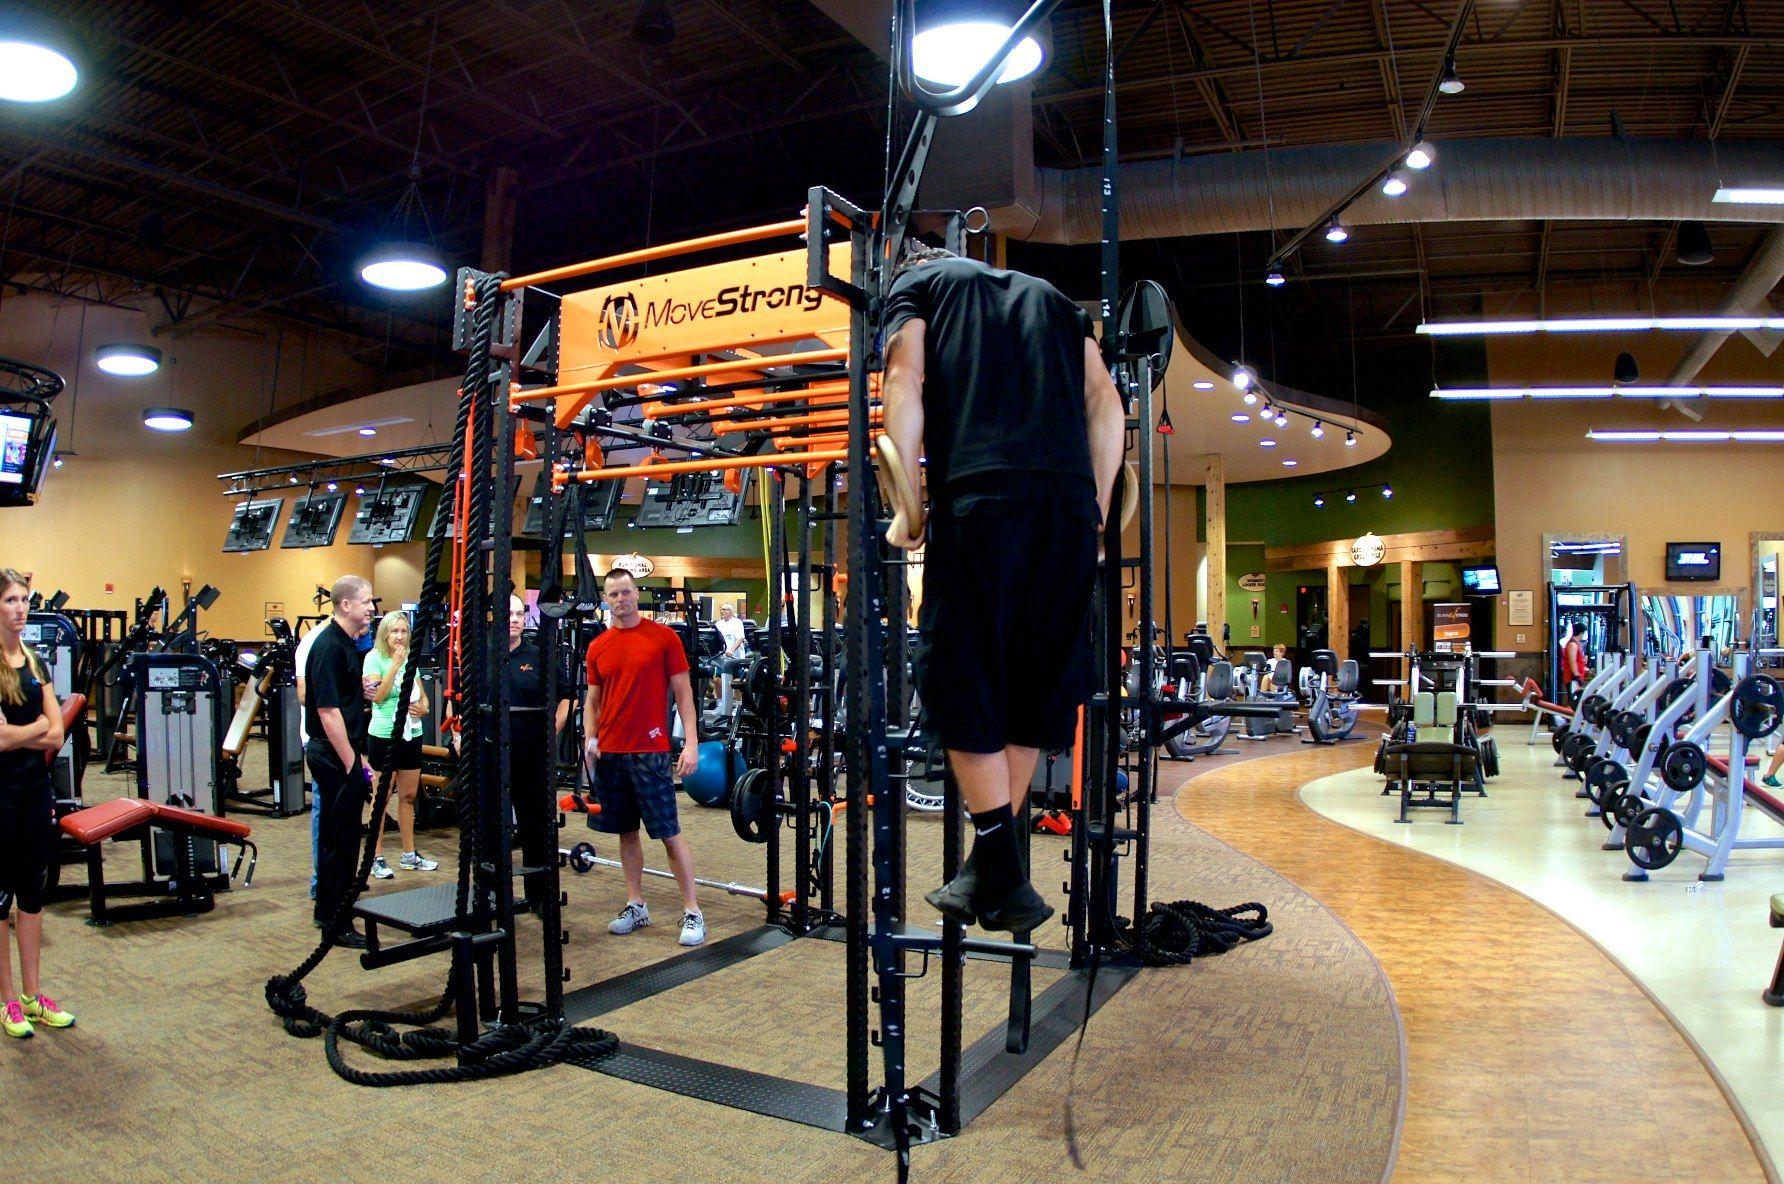 Atlanta Fitness functional training equipment